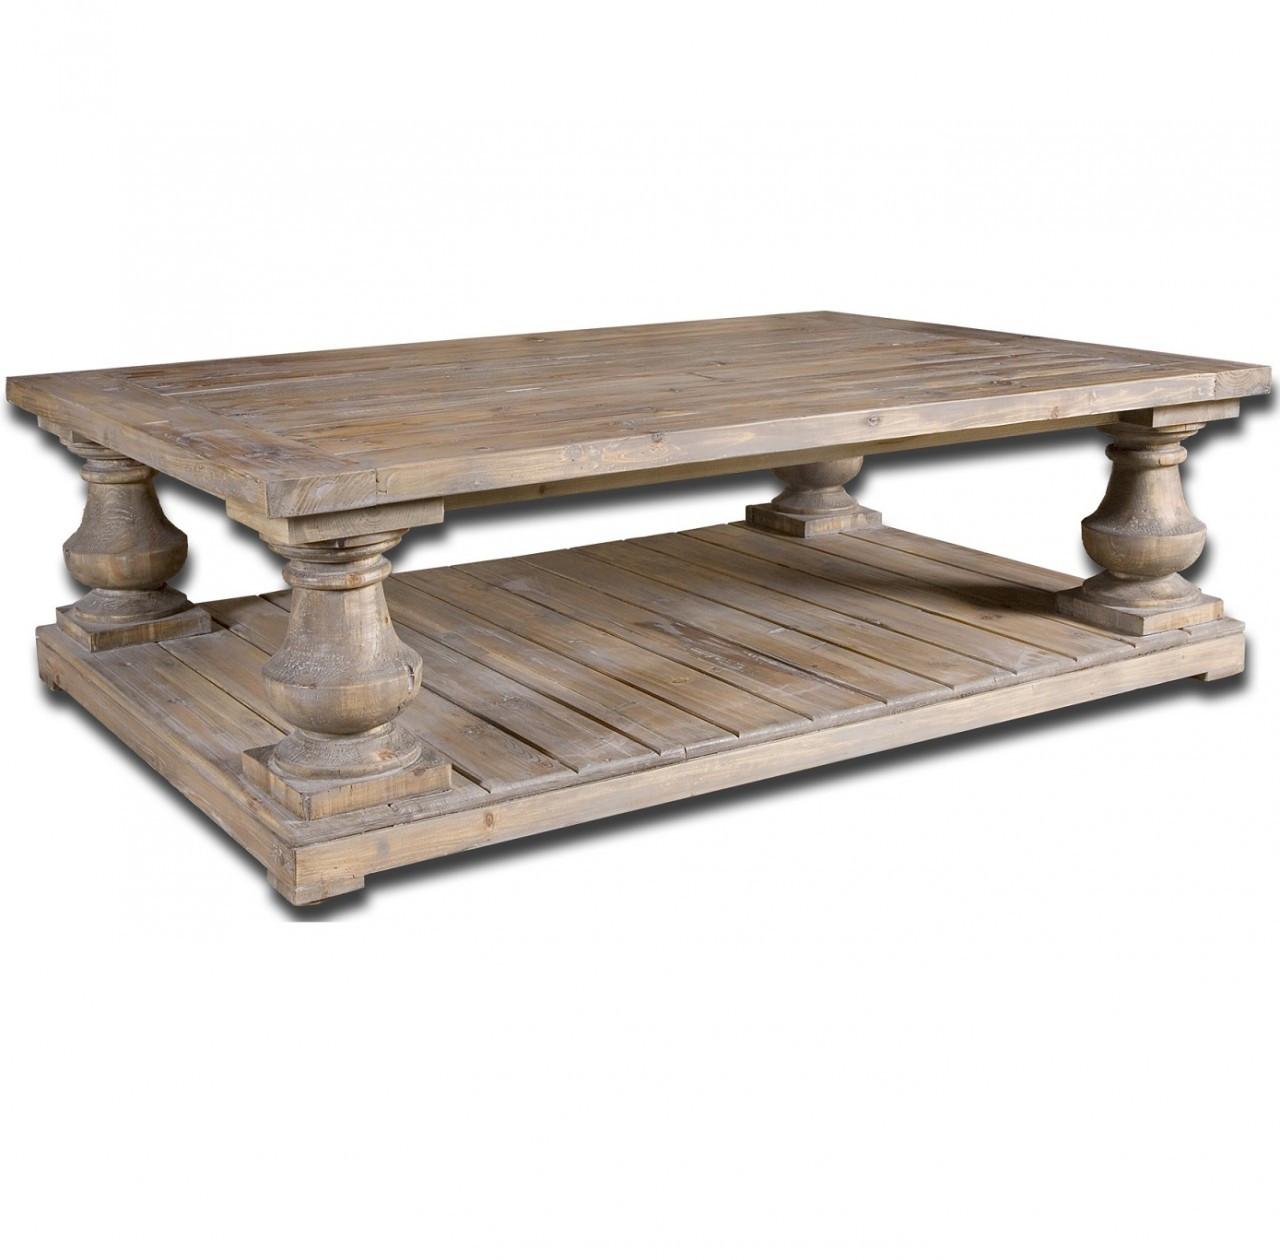 Reclaimed Wood Coffee Tables Modern Wood Coffee Table Zin Home